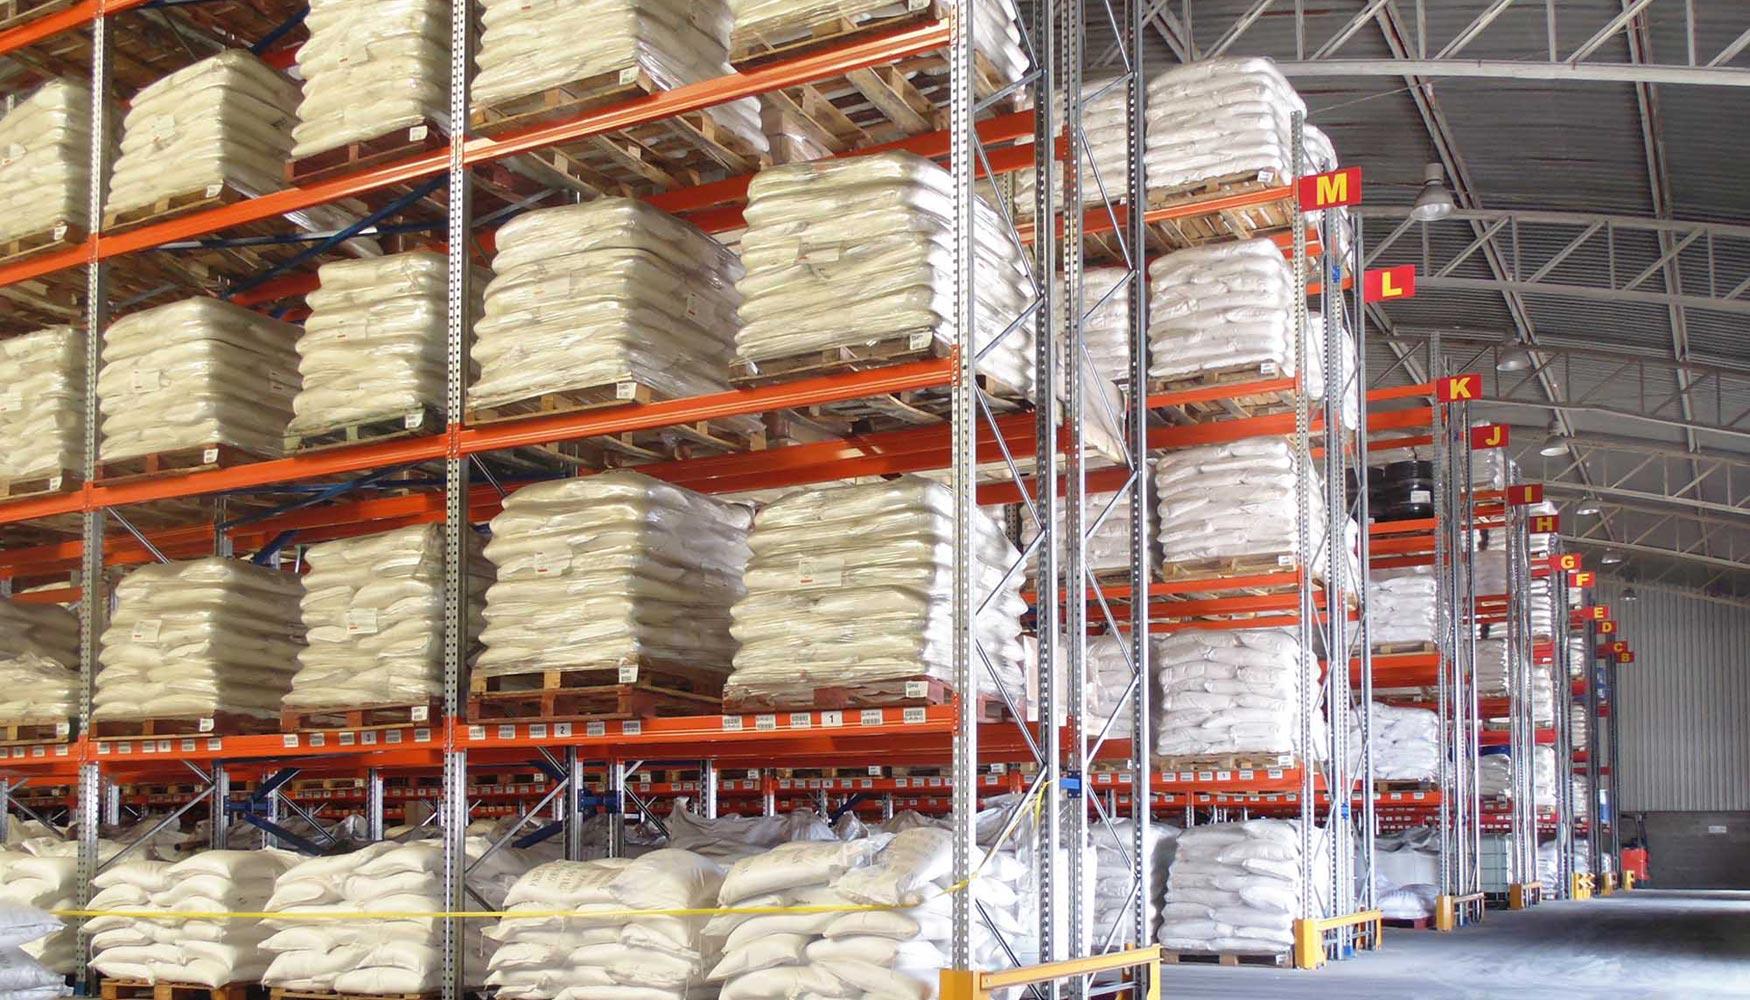 Ar racking instala un sistema de almacenaje para liplata en santiago de chile log stica - Sistemas de almacenaje ...